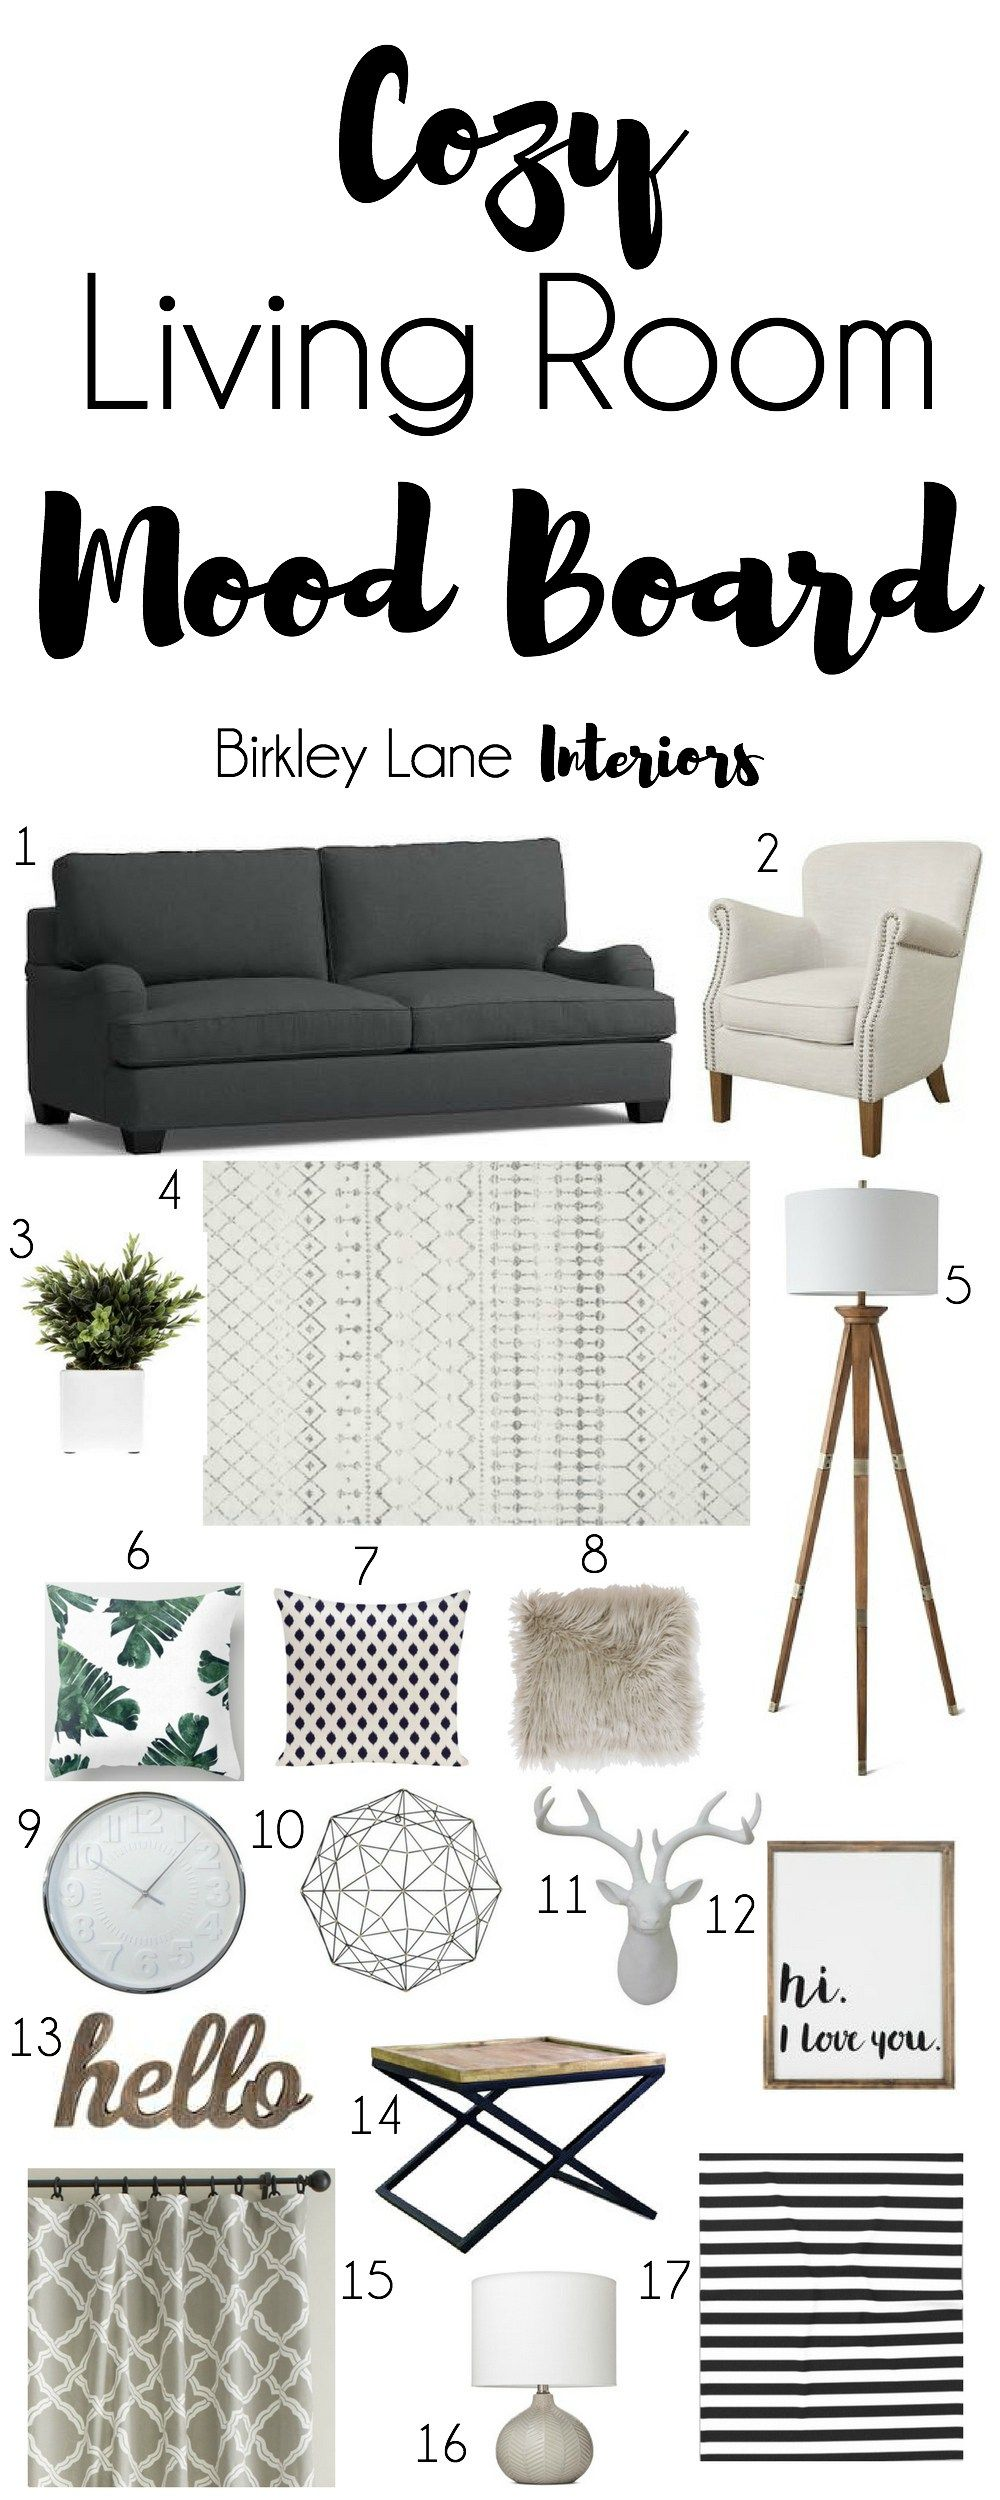 Cozy Living Room Mood Board | Pinterest | Living room grey, Grey ...